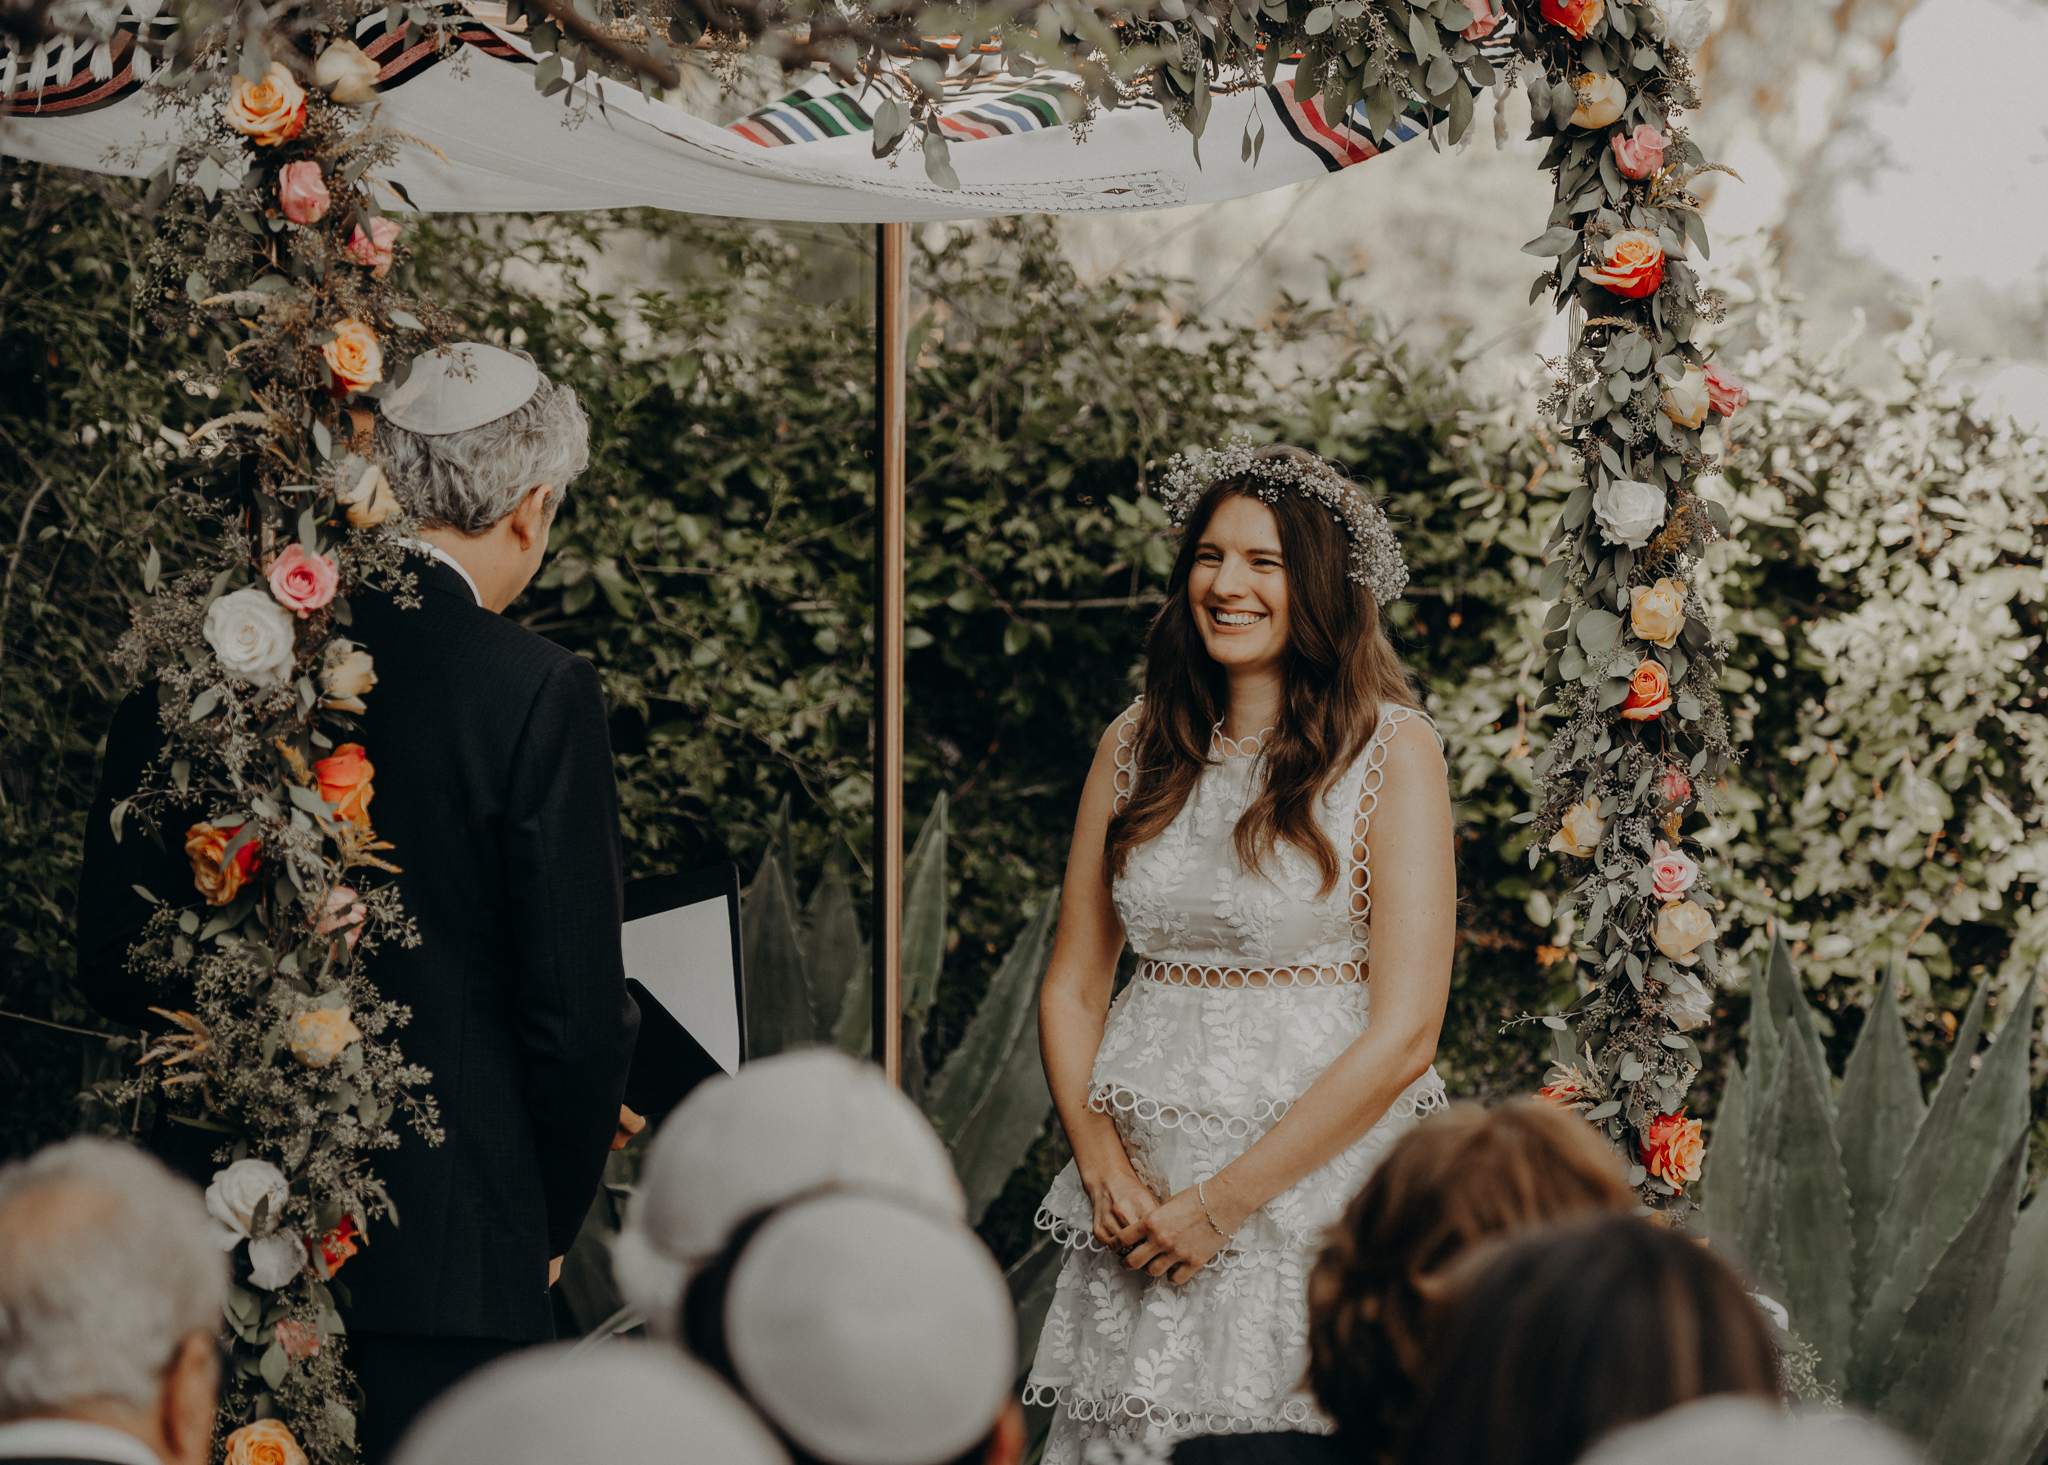 Isaiah + Taylor Photography - Private Estate Backyard Wedding - Beverly Hills - Los Angeles Wedding Photographer - 72.jpg